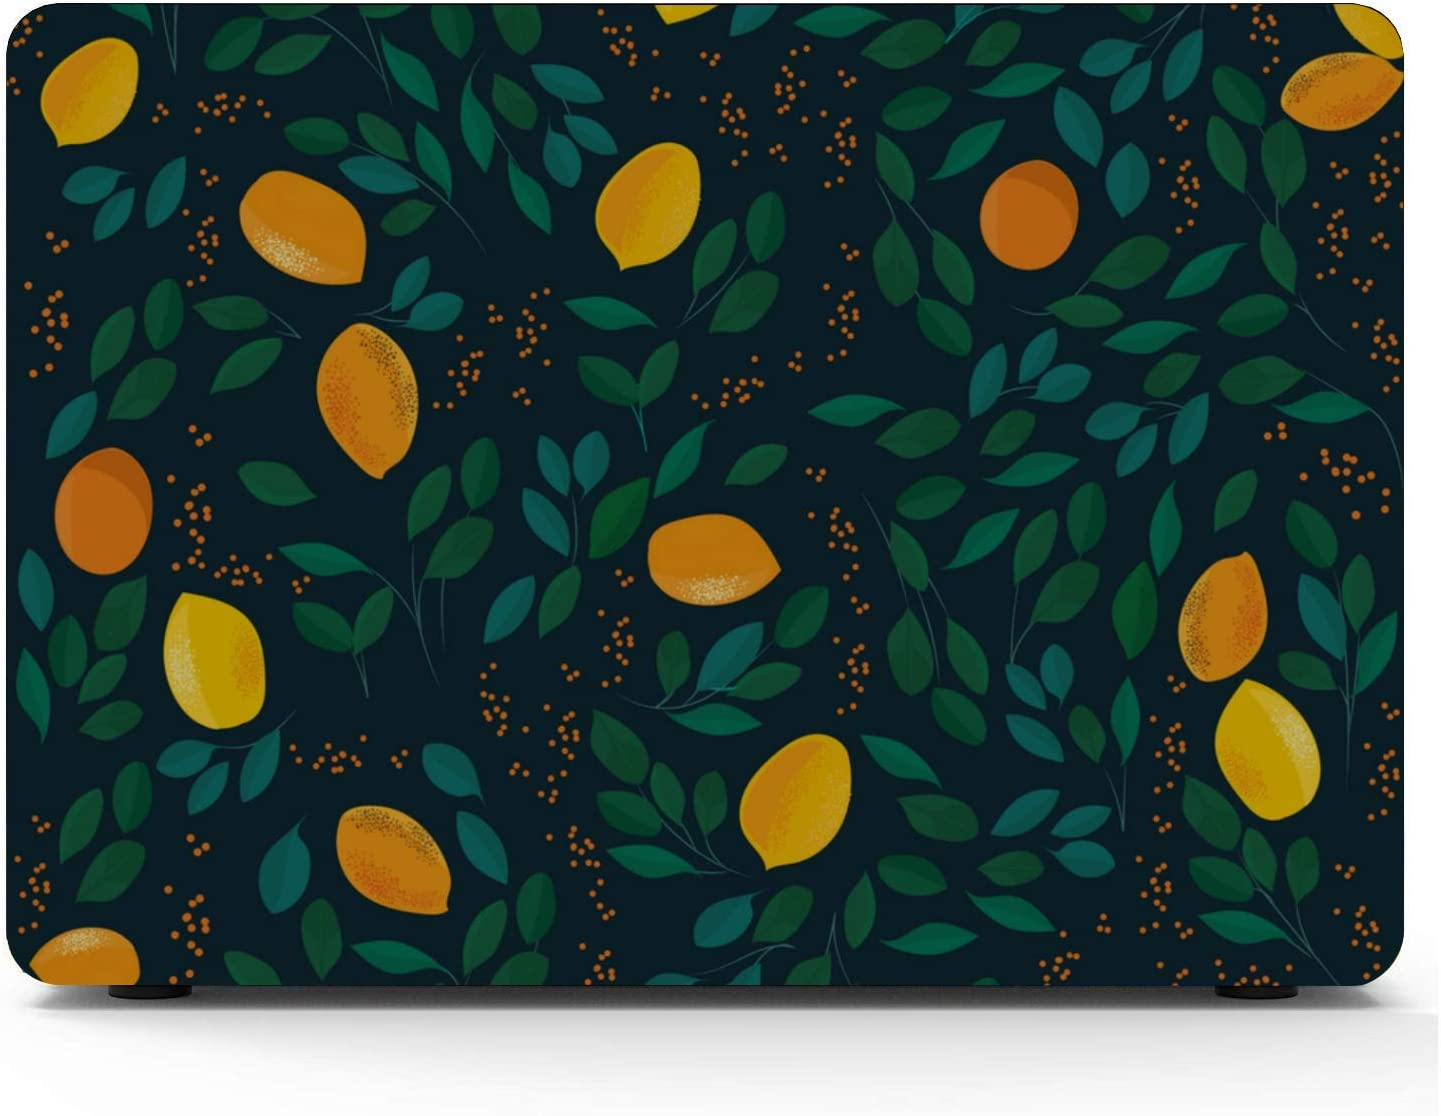 MacBook Accessories Case Summer Fruit Grapefruit Green Leaf Plastic Hard Shell Compatible Mac Air 11 Pro 13 15 Case MacBook Pro Protection for MacBook 2016-2019 Version